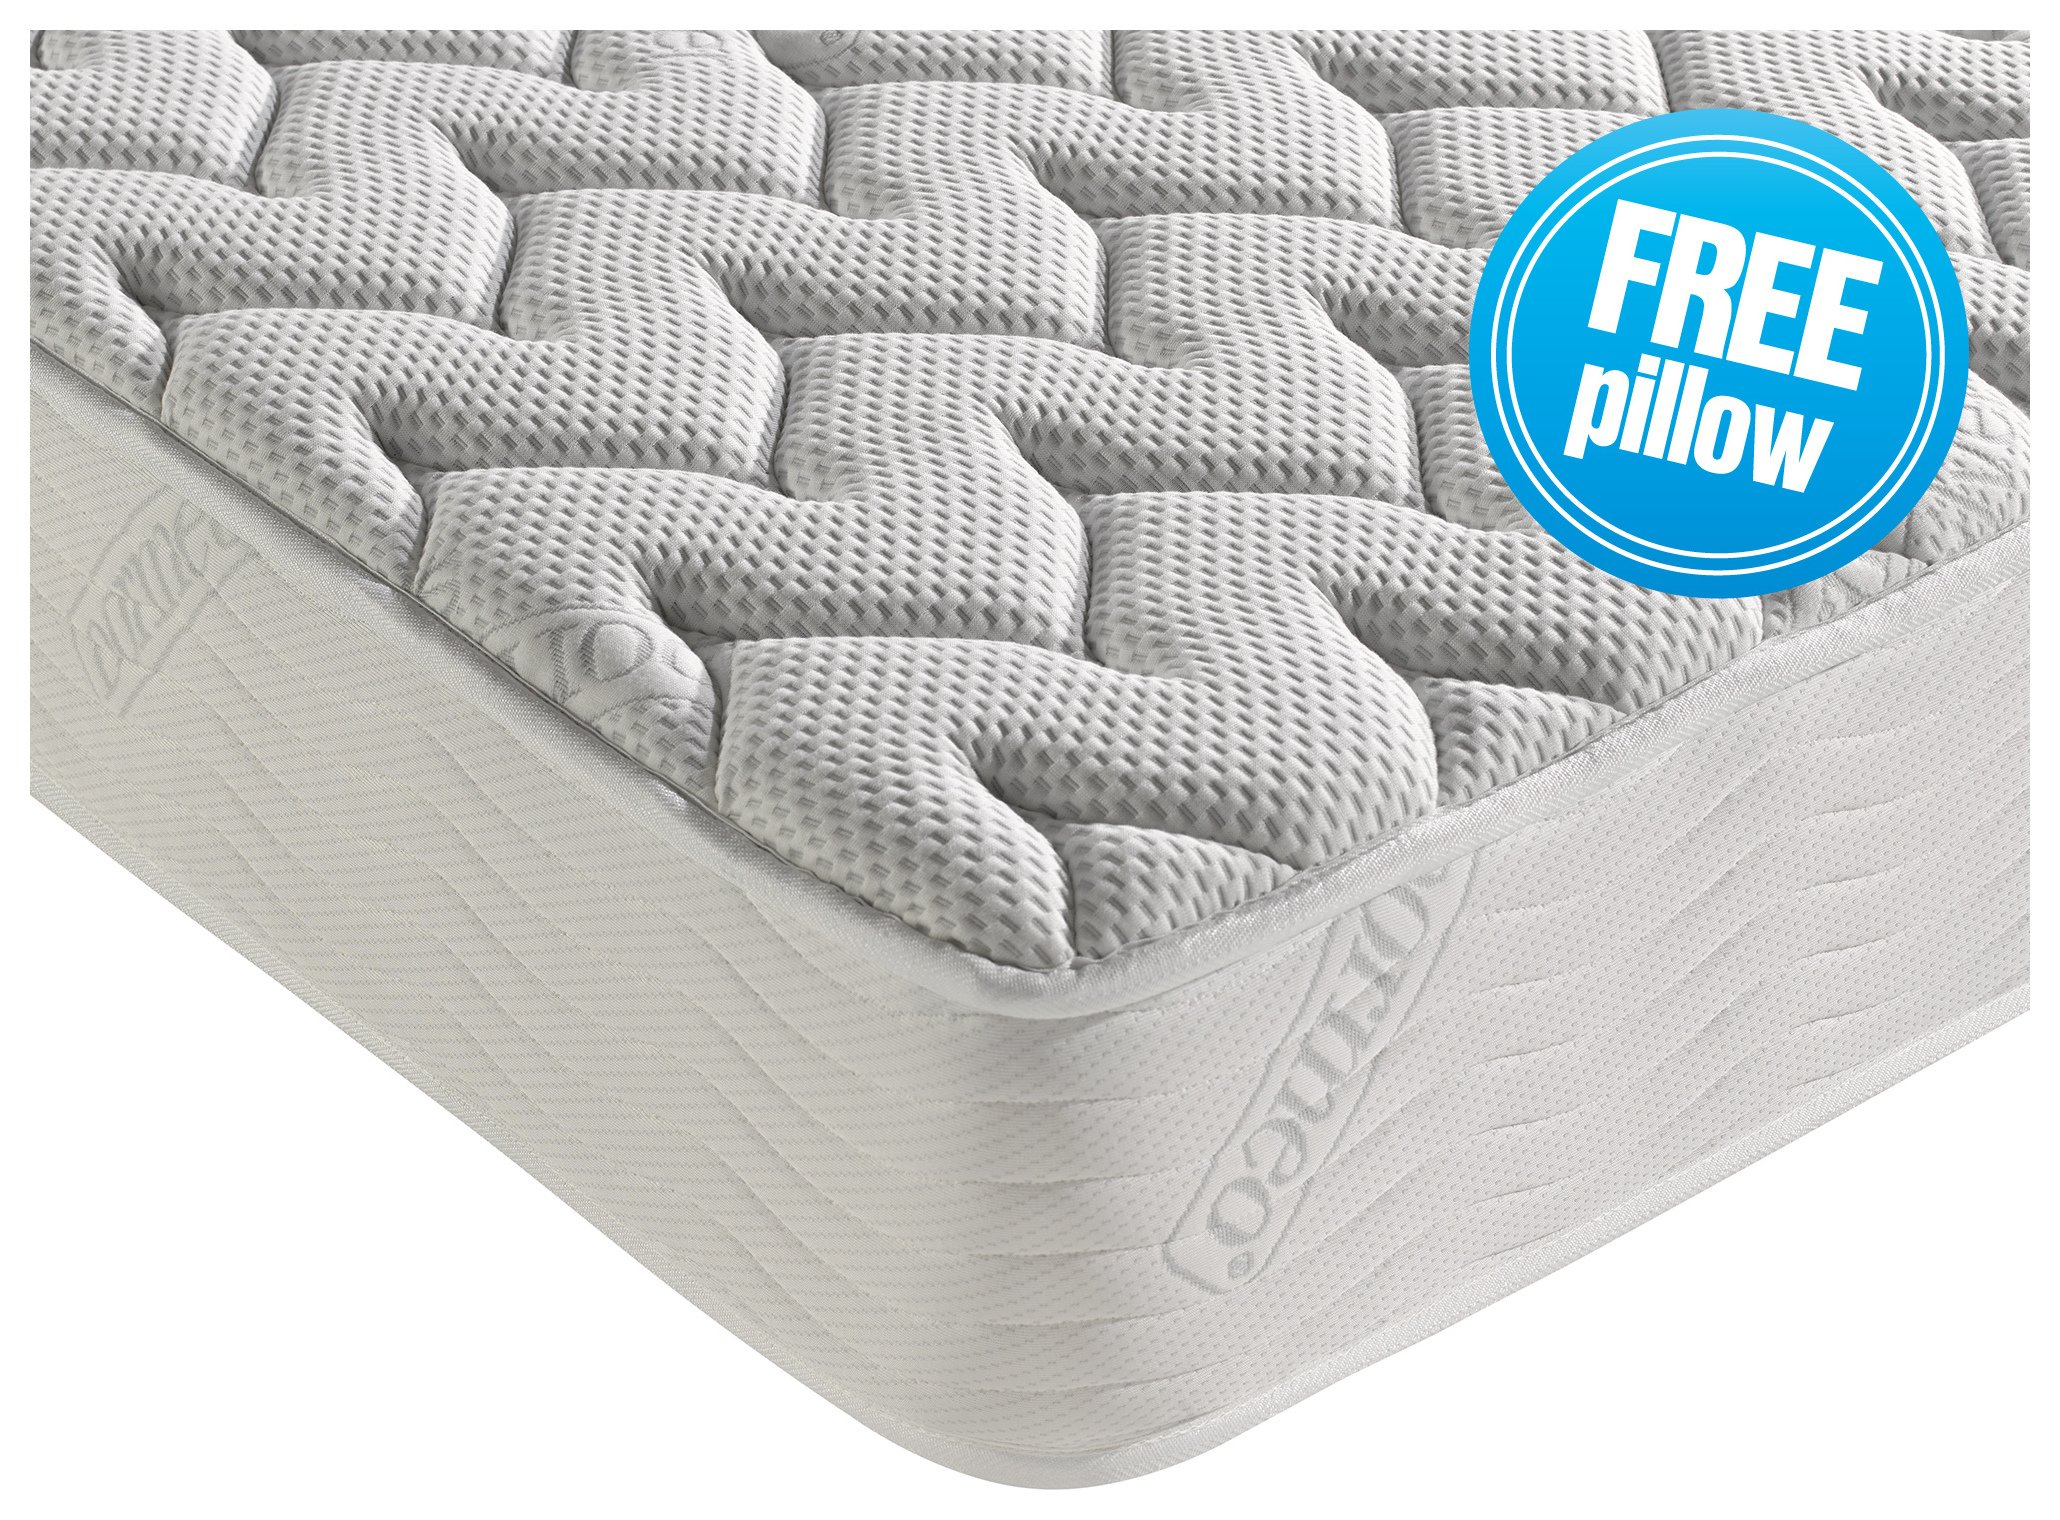 Dormeo Silver Plus Memory Foam Double Mattress